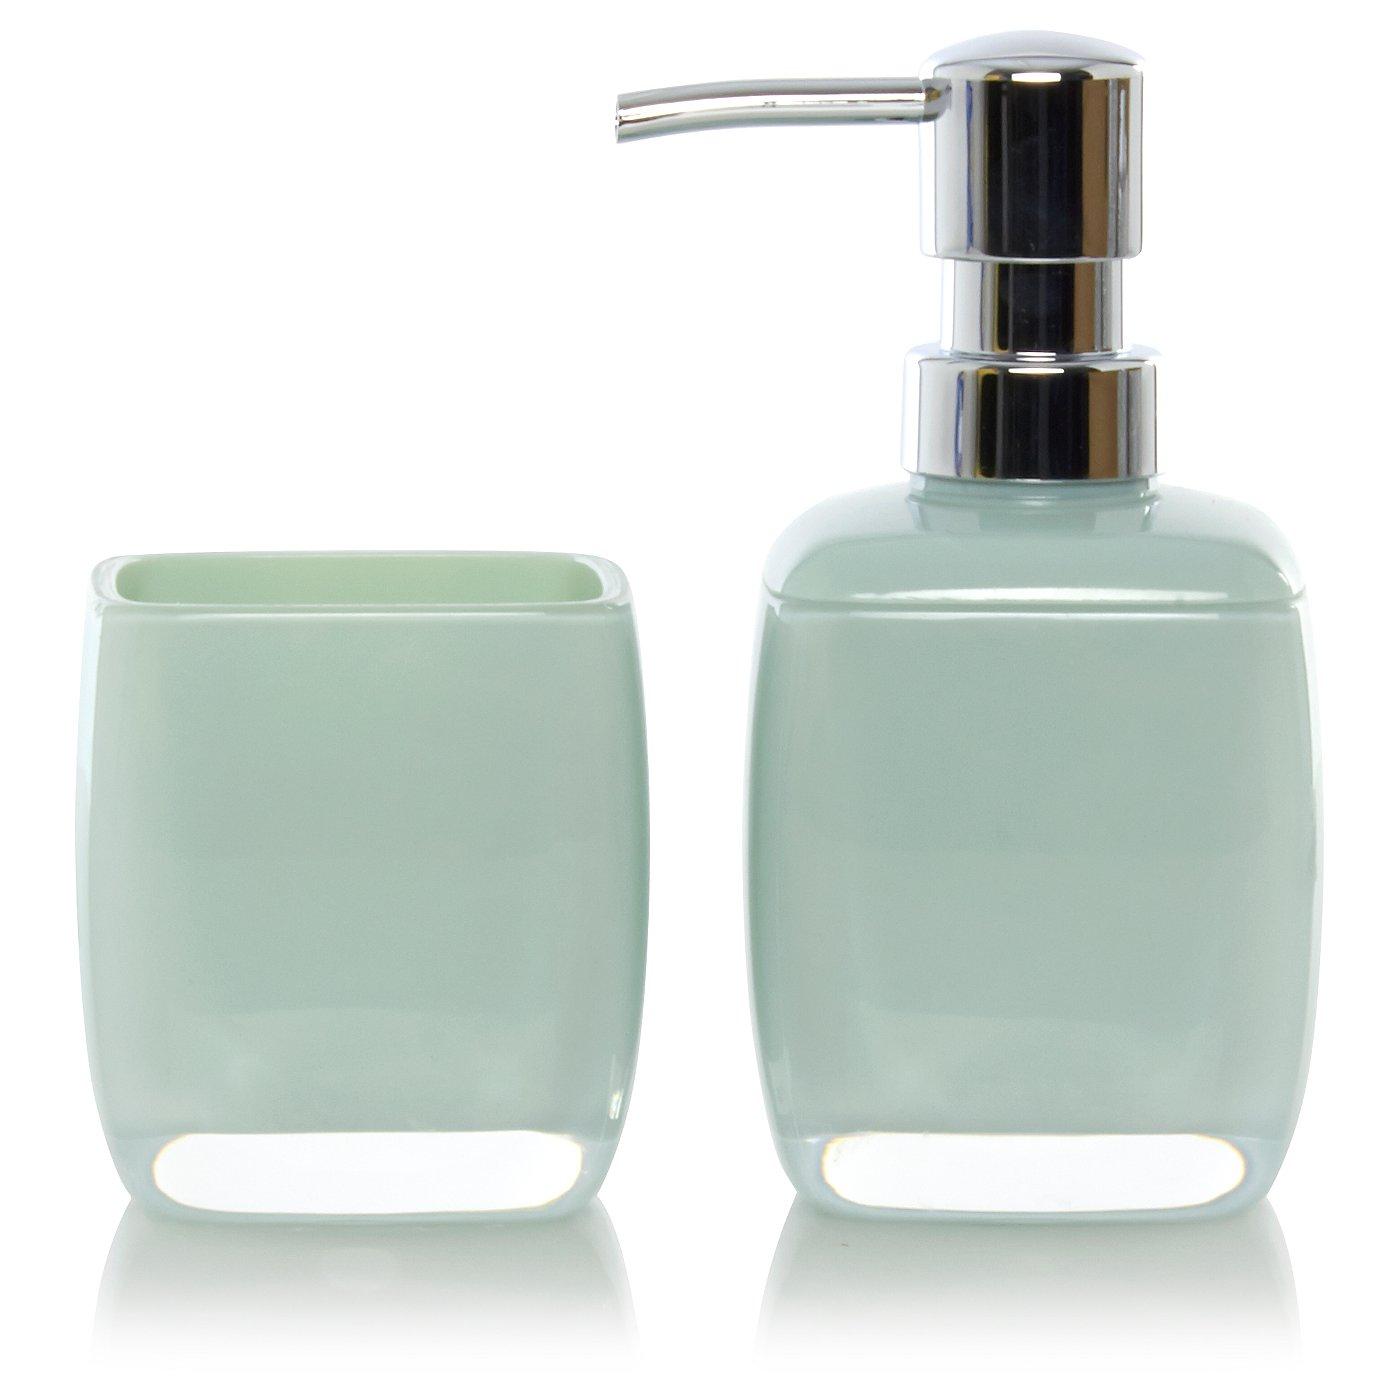 green bathroom accessories homezanin green bathroom accessories homezanin mint green bathroom accessories homezanin